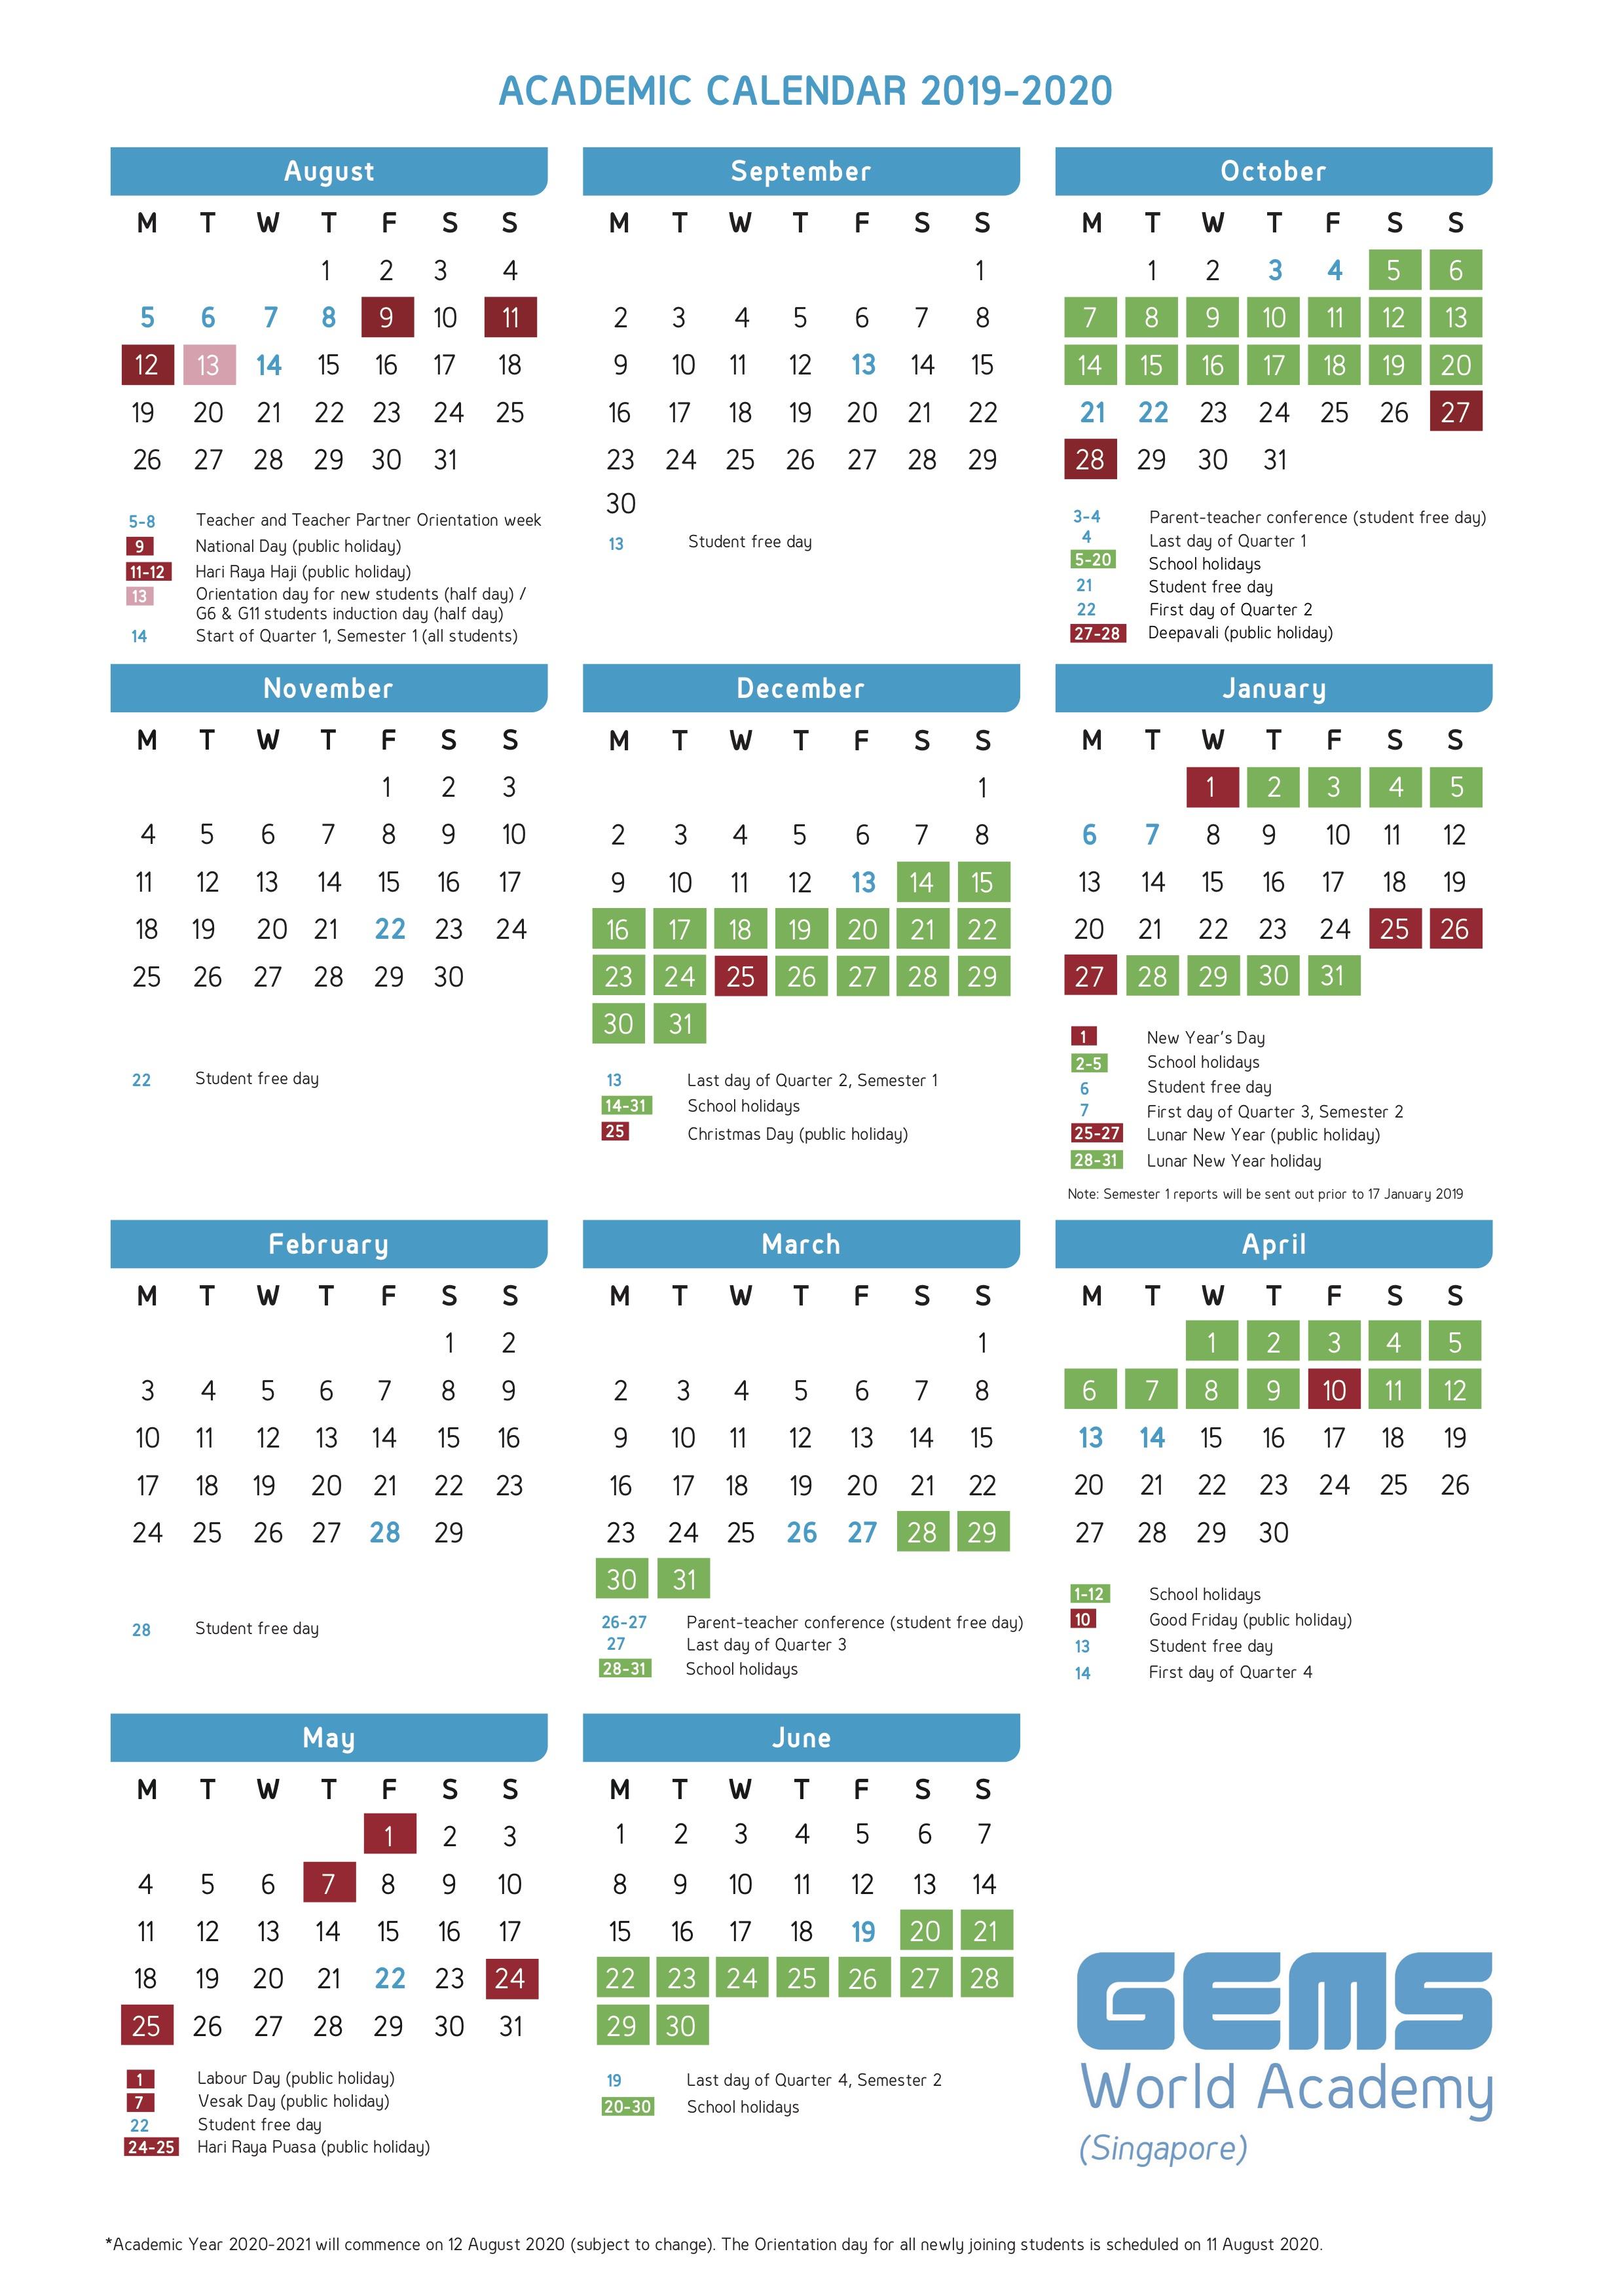 Academic Calendar | Gems World Academy (Singapore) intended for U Of M 2019 2020 Calendar